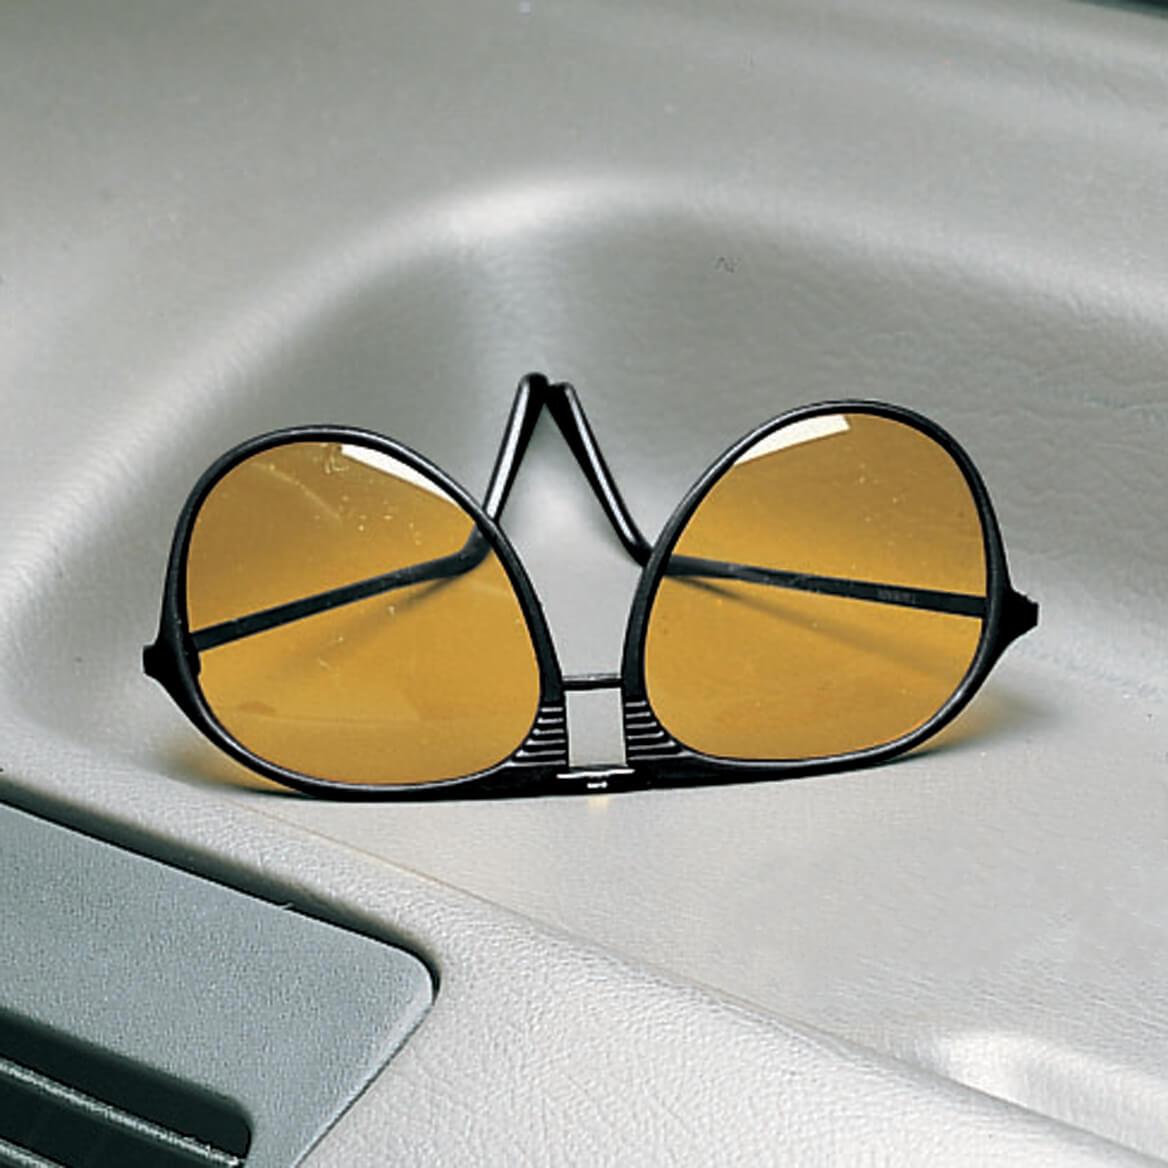 33e05d966bdc Aviator Night Driving Glasses-305680 Aviator Night Driving Glasses-305680